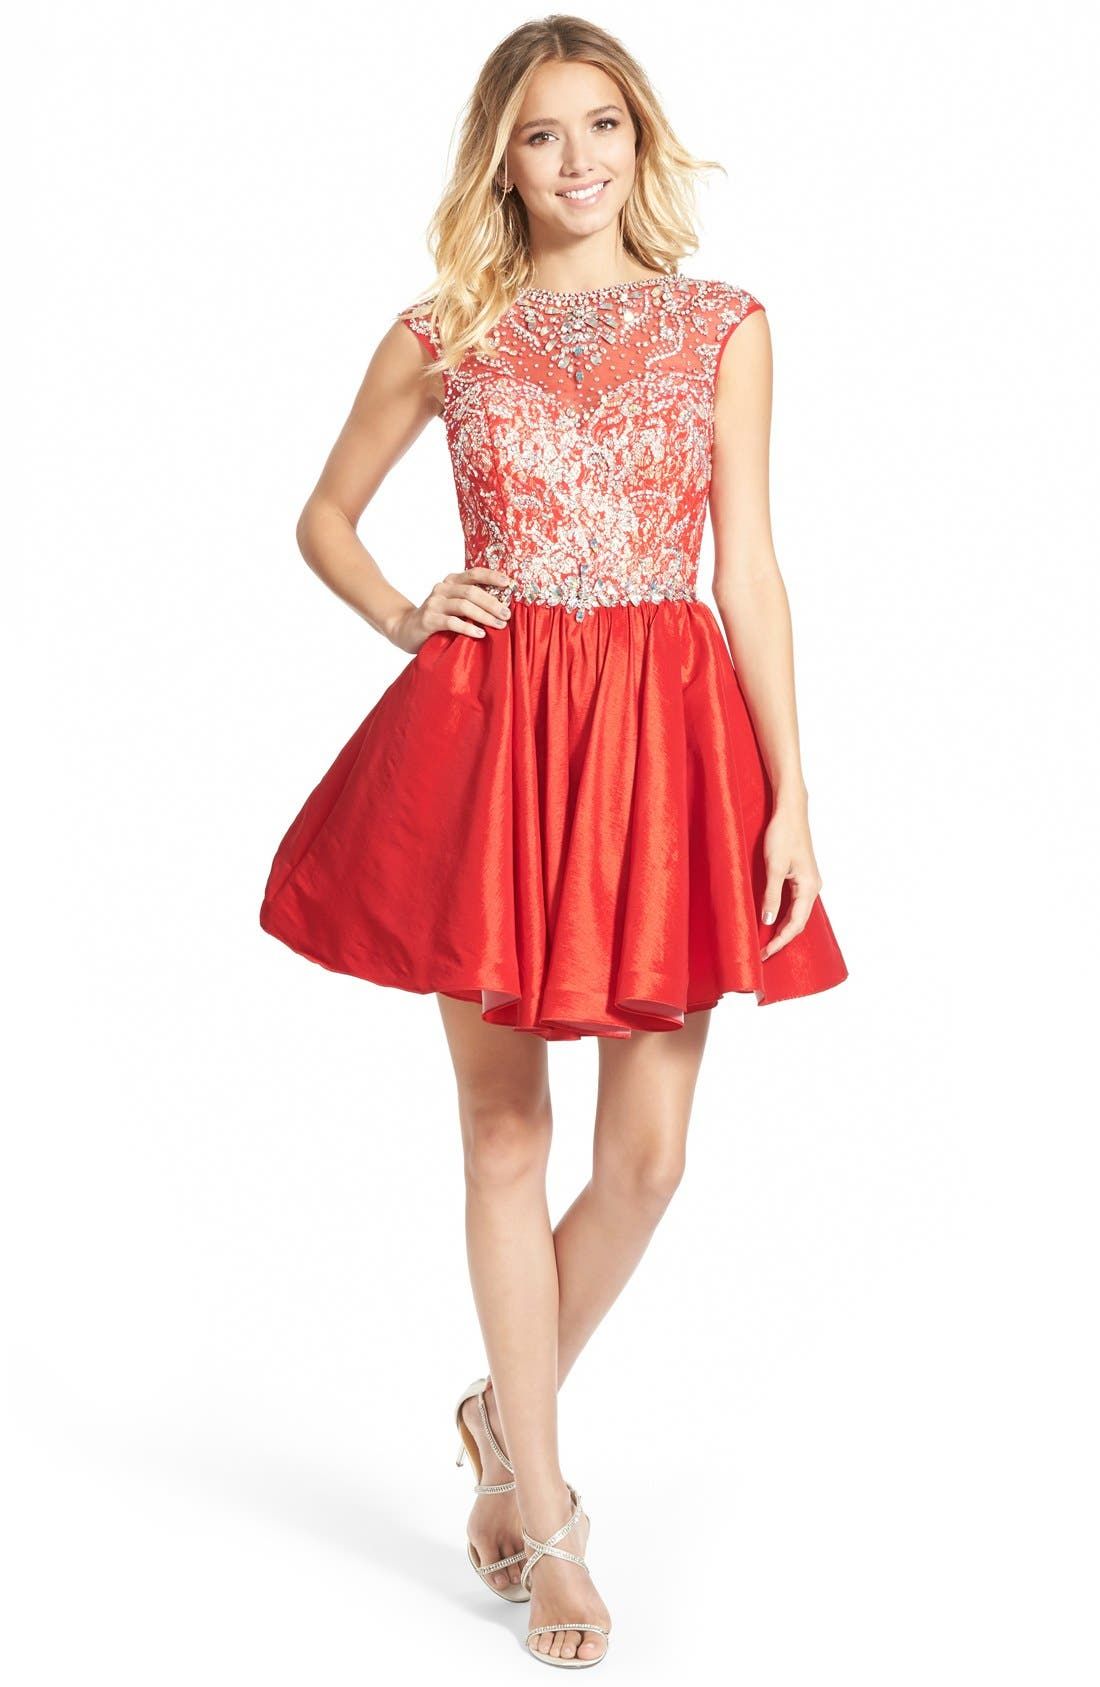 Main Image - Mac Duggal Embellished Bodice Skater Dress